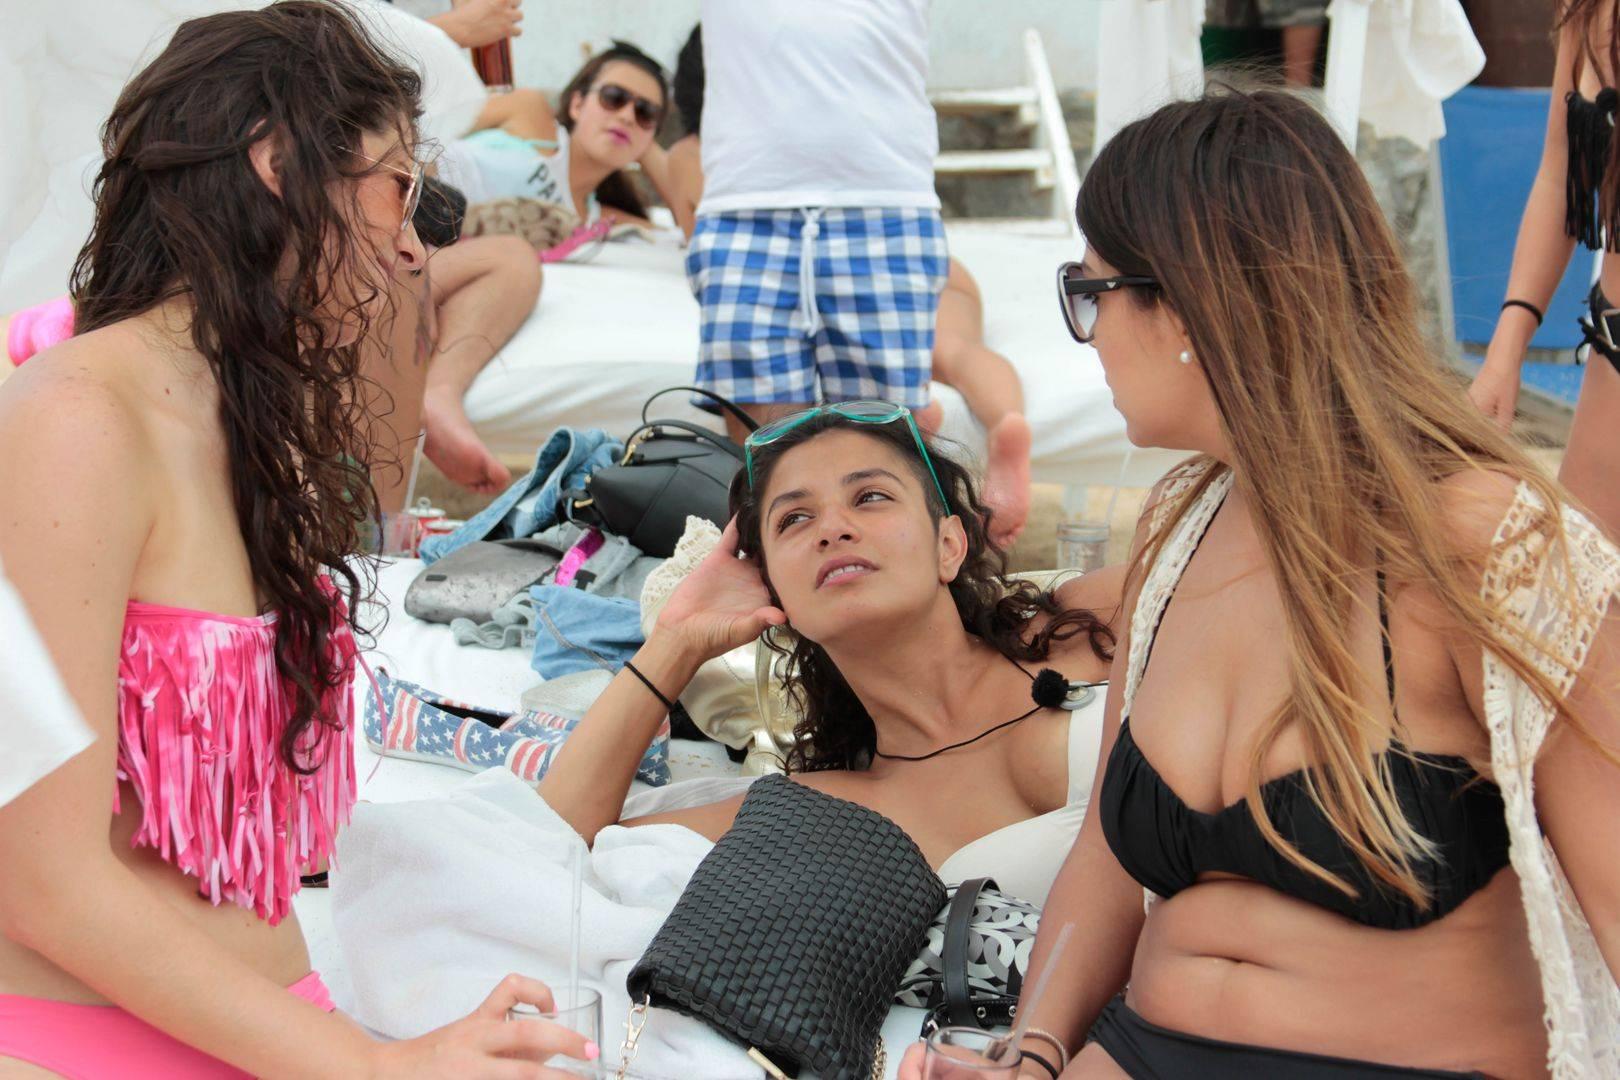 mgid:file:gsp:scenic:/international/mtvla.com/acapulco-shore/fotogalerias/episodio-9/behind/acashore_108_Behind_-2.jpg